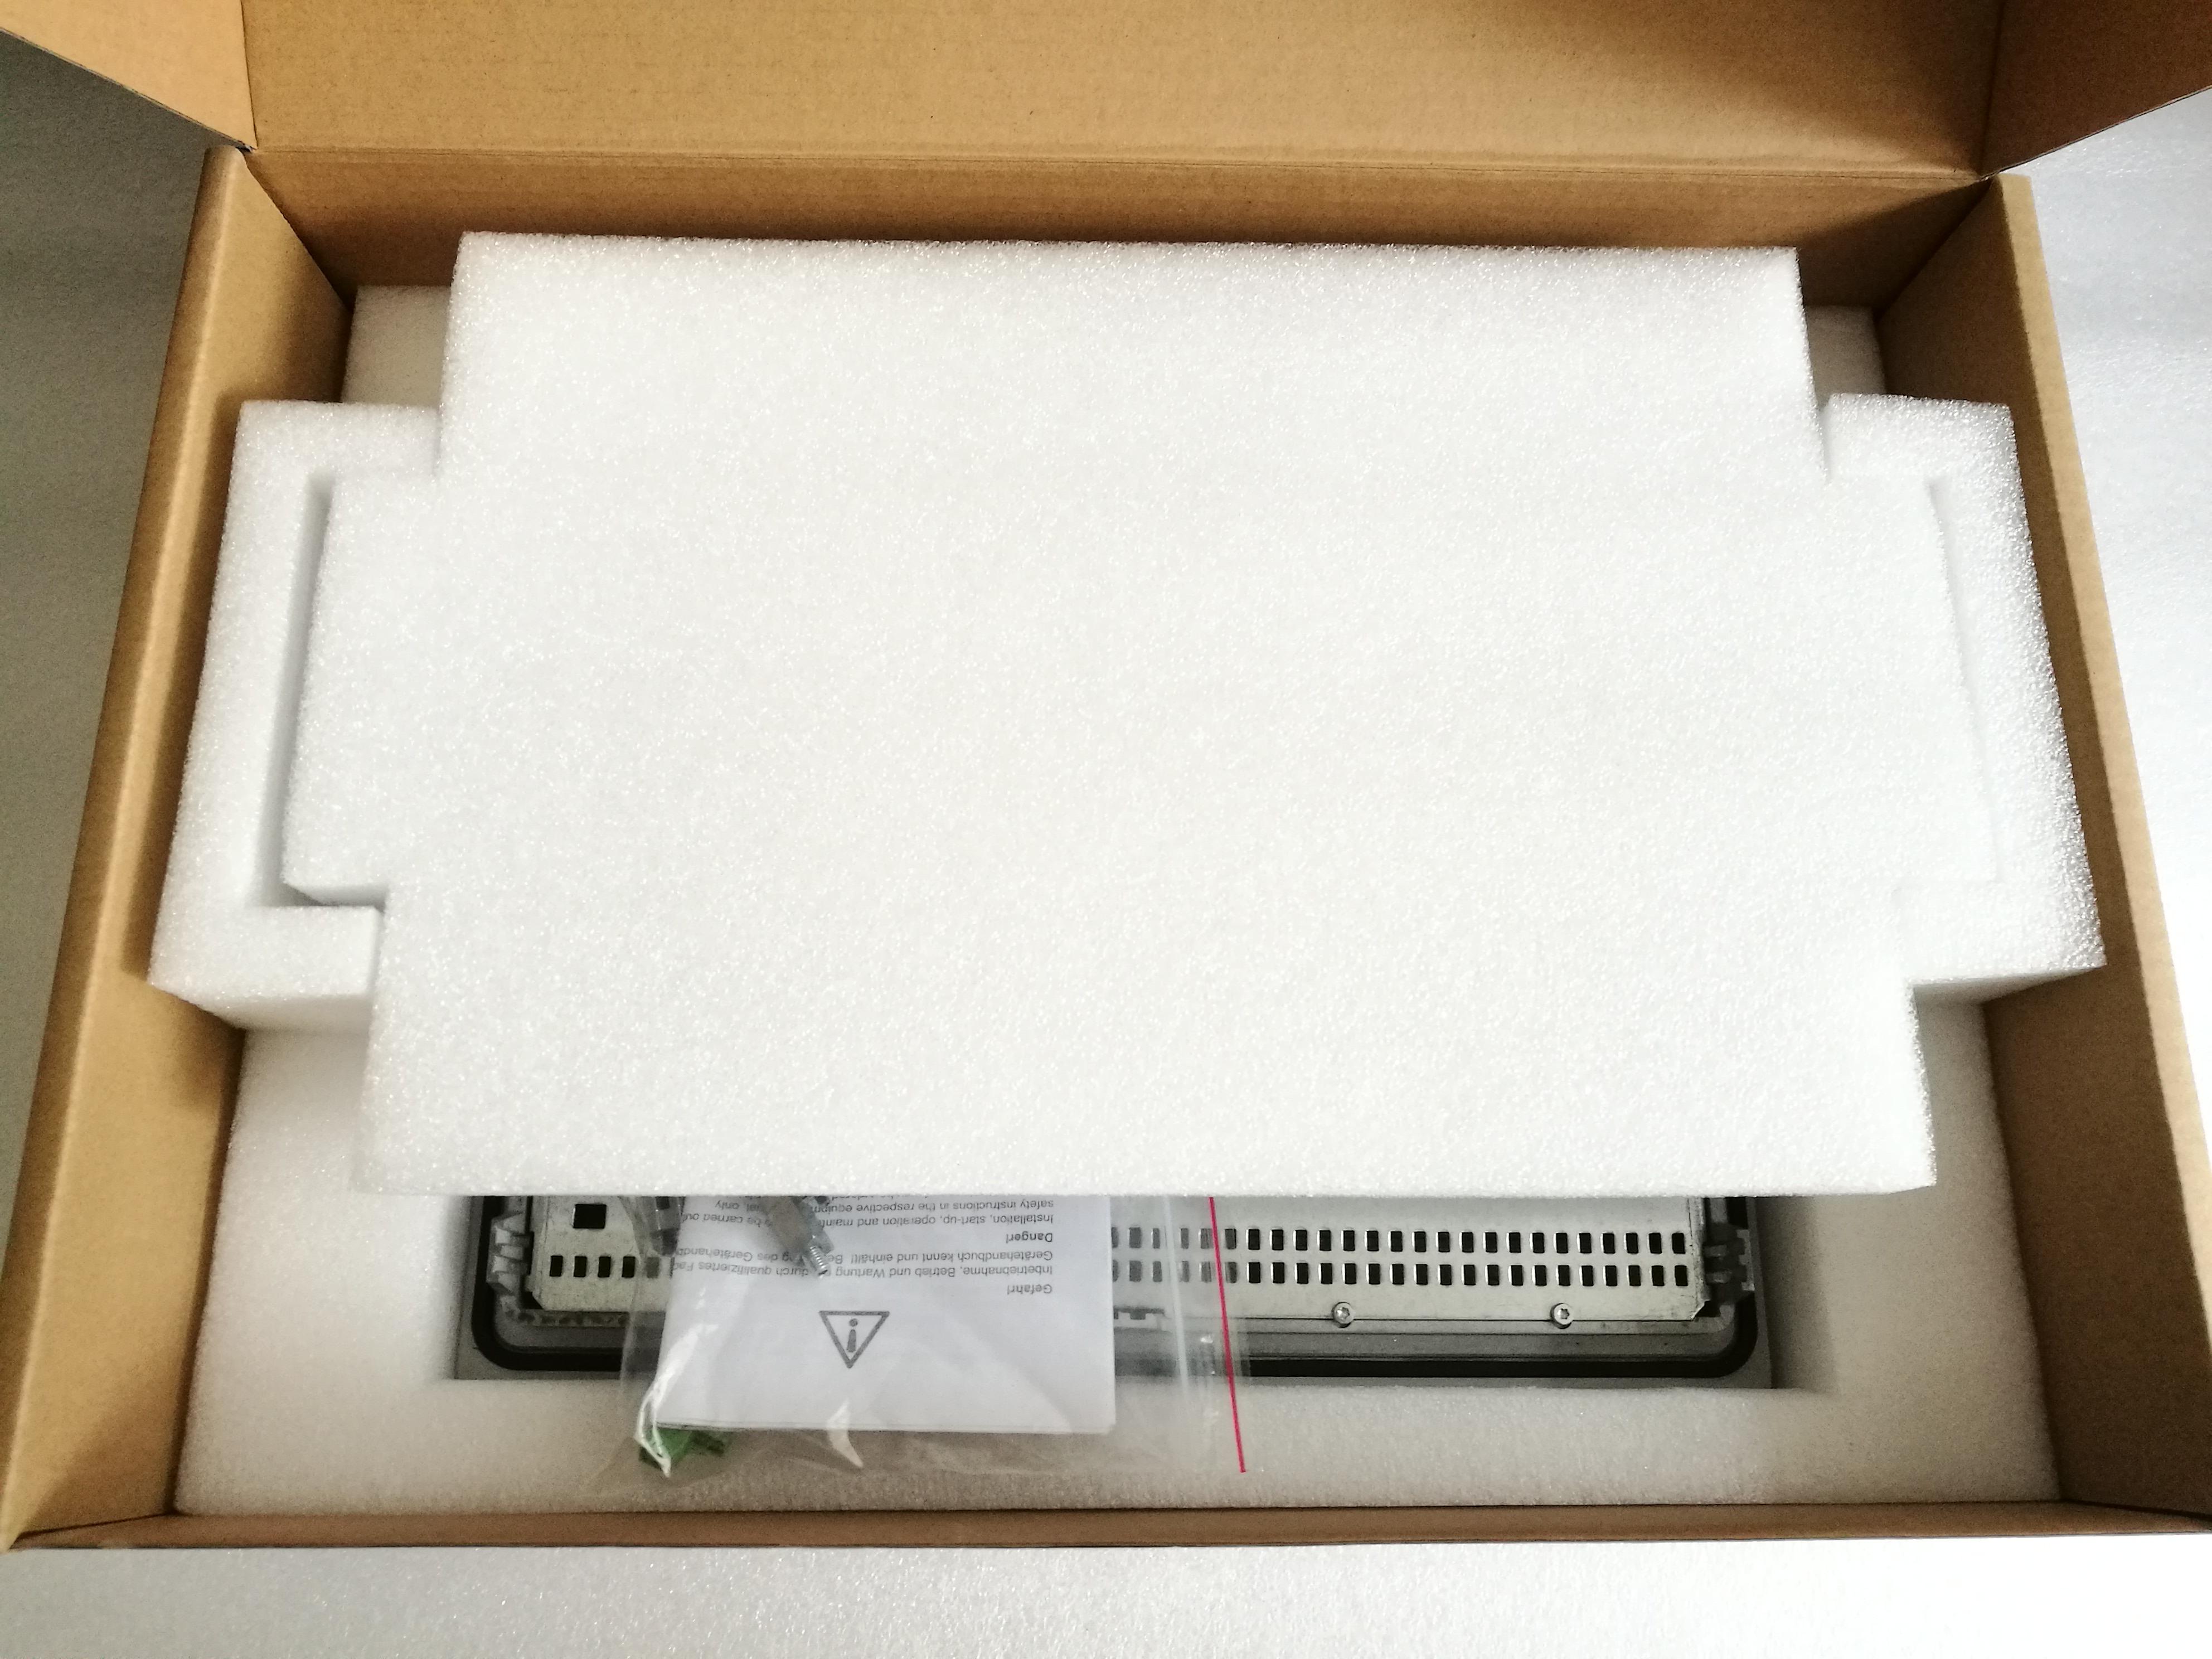 西门子 SIEMENS 触摸屏 6AV6545-0AG10-0AX0 现货 西门子,SIEMENS,触摸屏,6AV6545-0AG10-0AX0,HMI